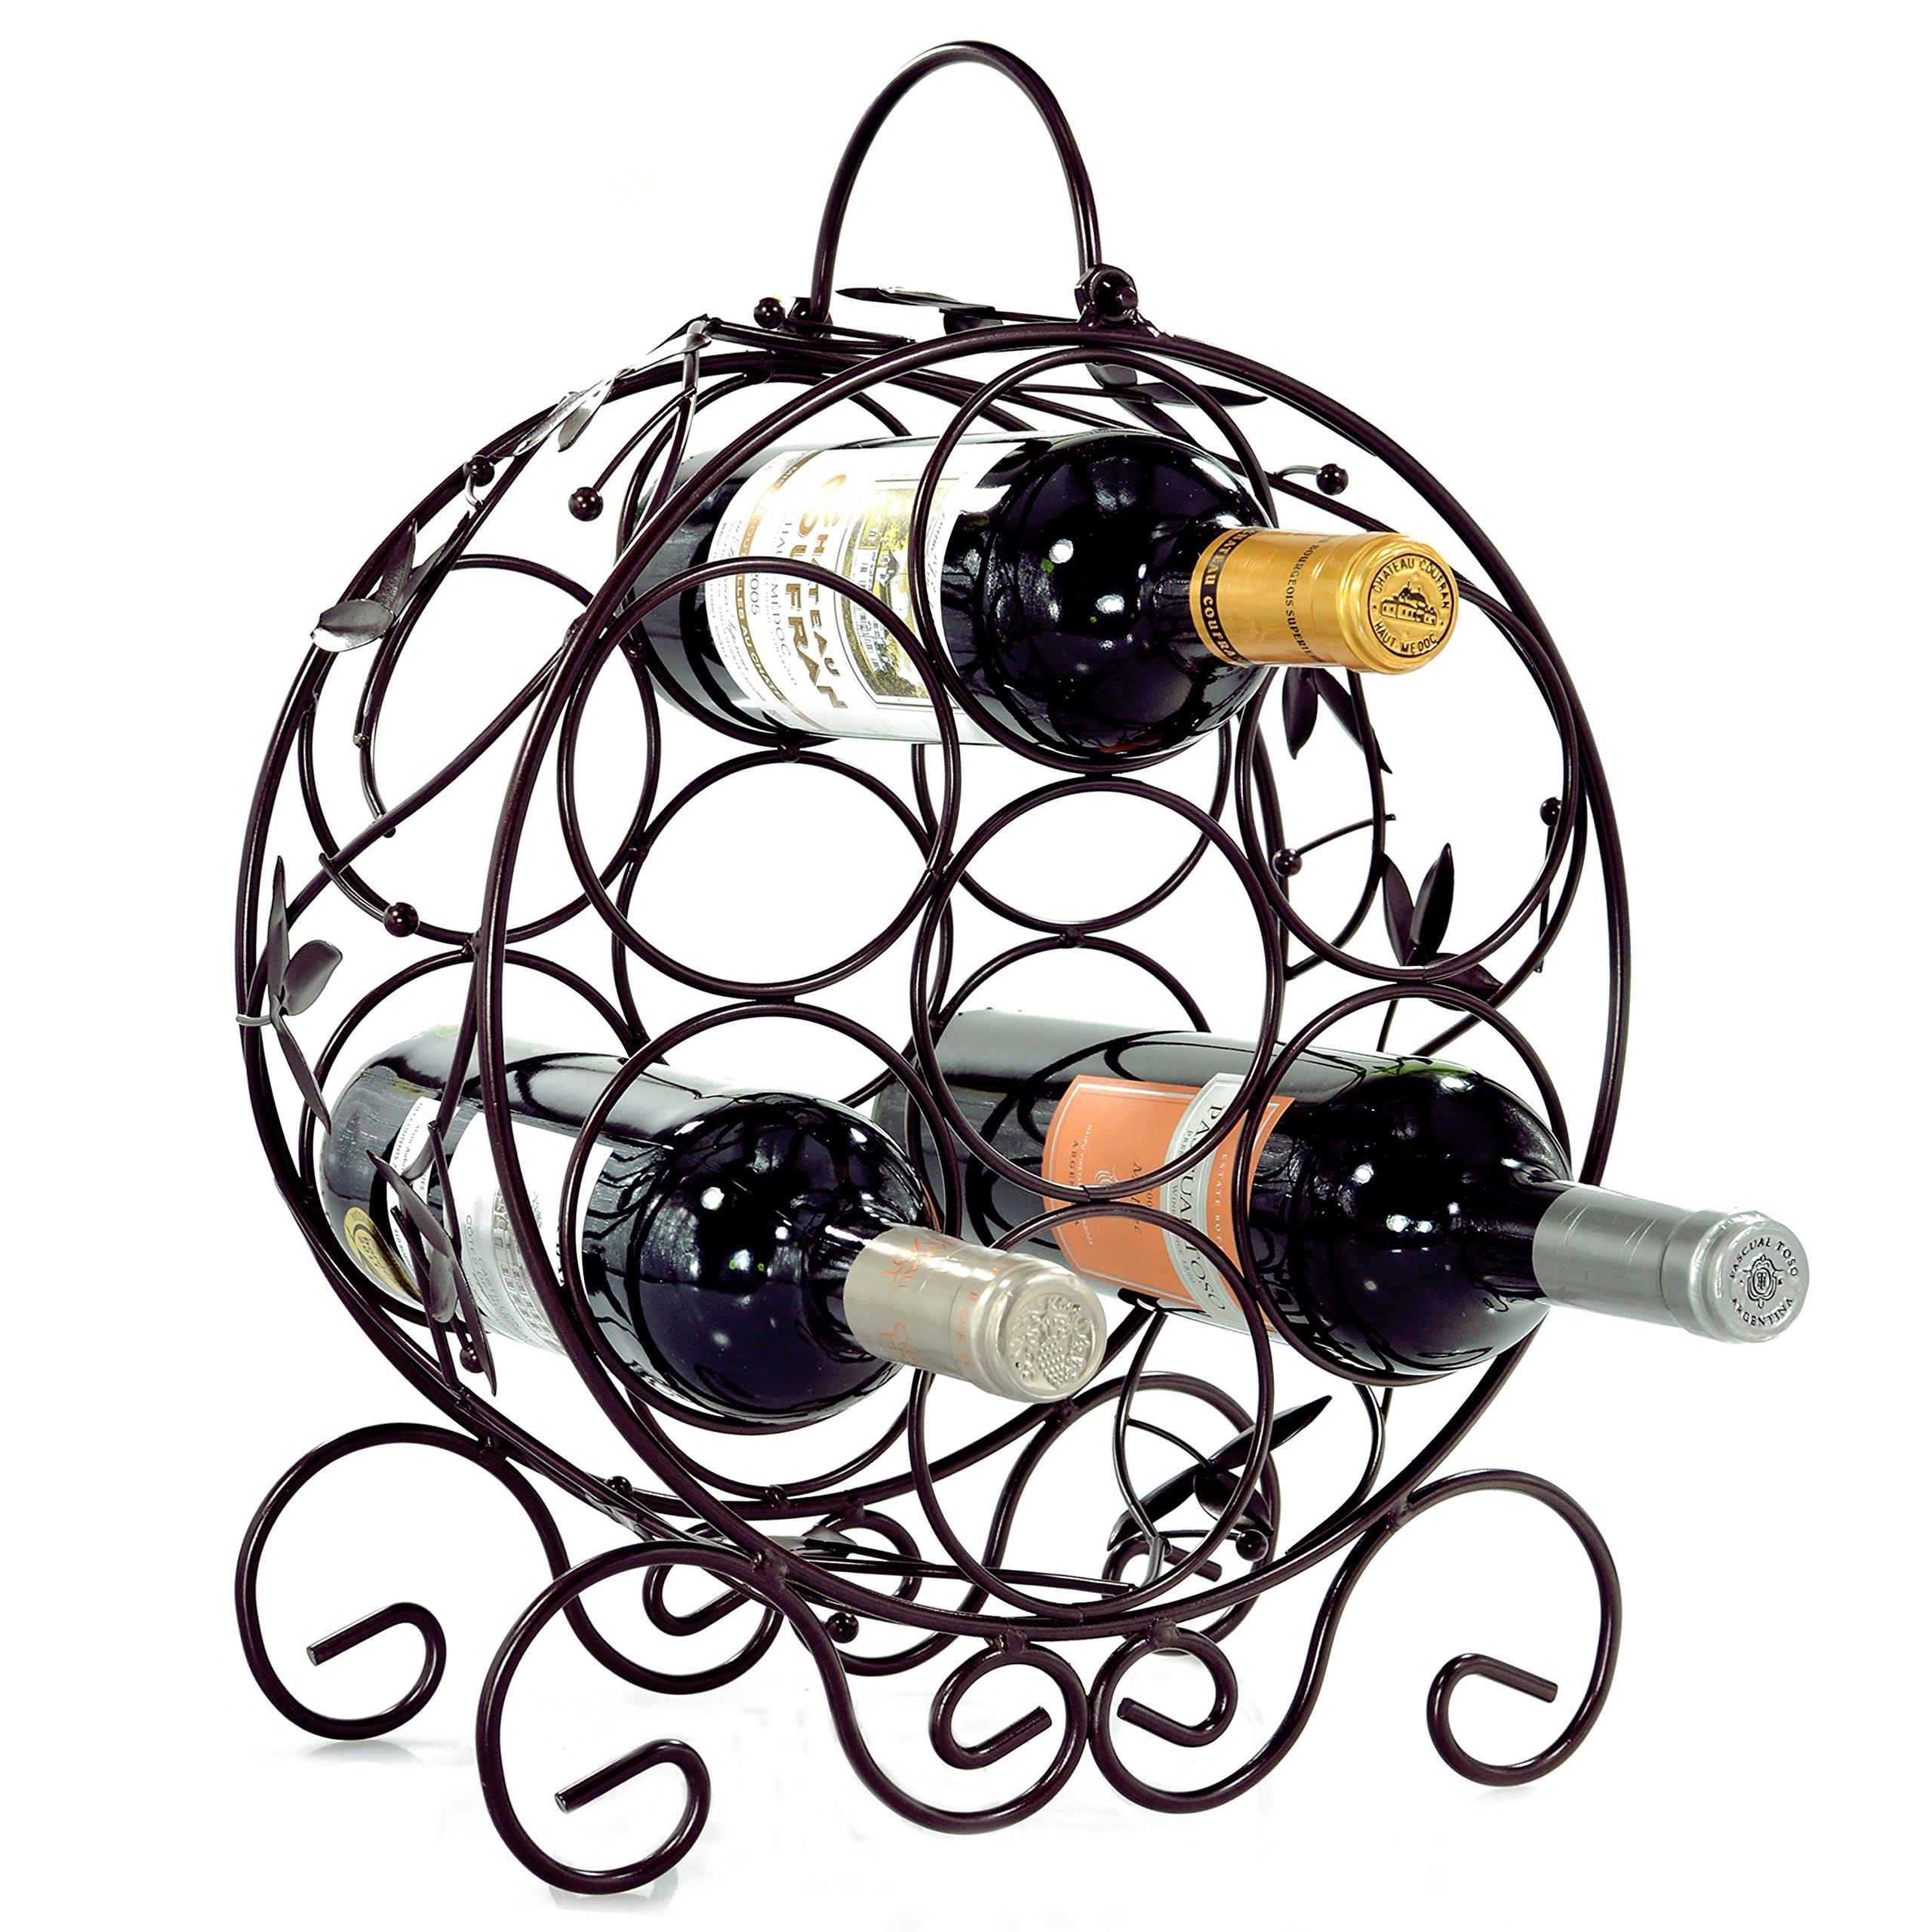 Elegant 7 Bottle Freestanding Countertop Metal Wine Rack/Espresso Brown Leaf Décor Wine Storage Holder